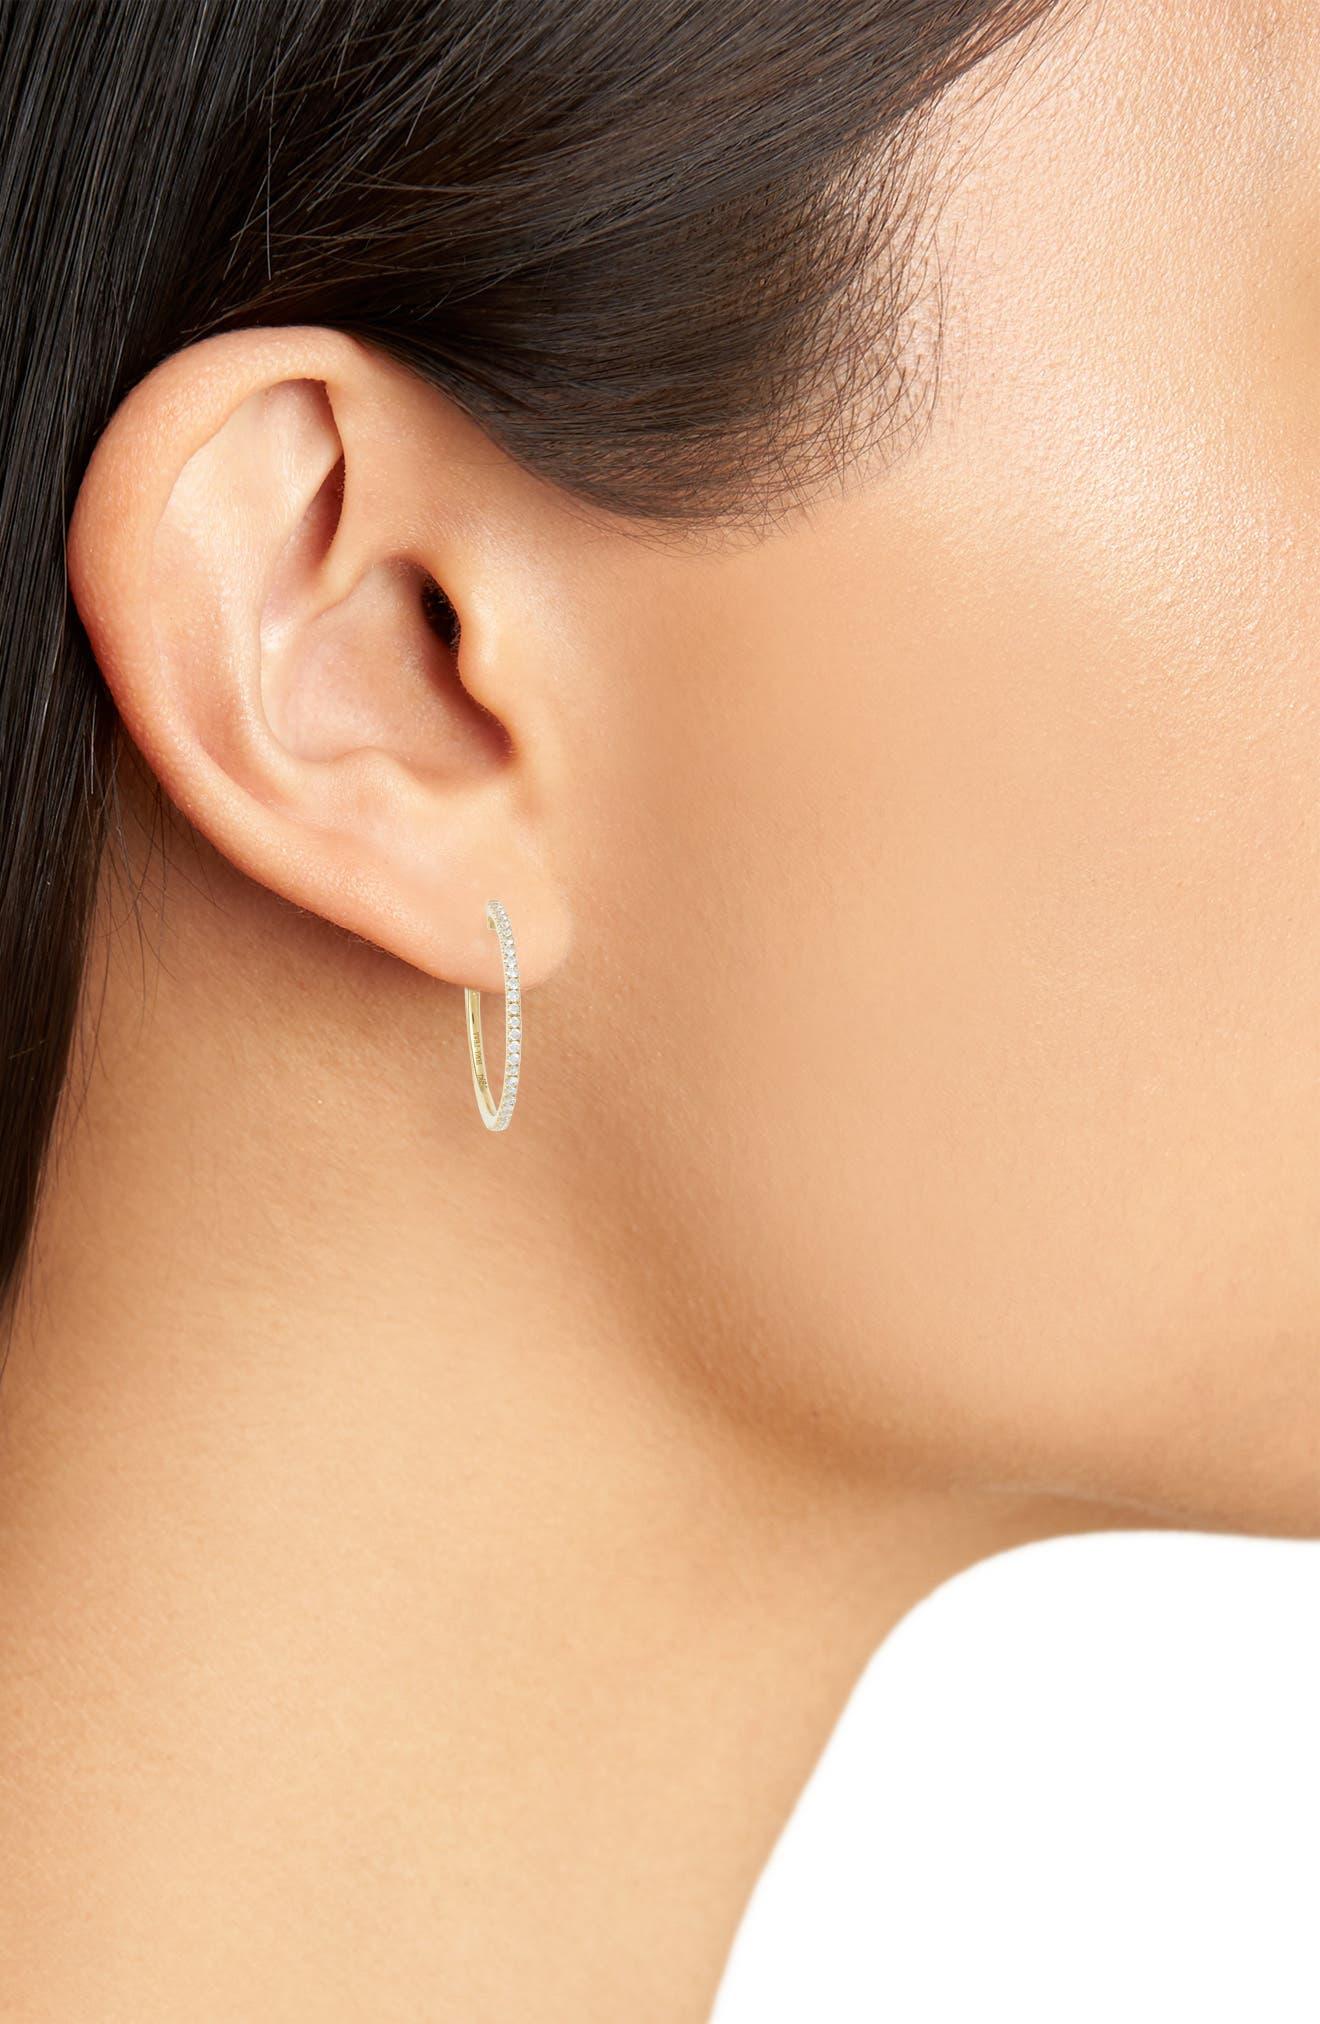 Small Diamond Hoop Earrings,                             Alternate thumbnail 2, color,                             YELLOW GOLD